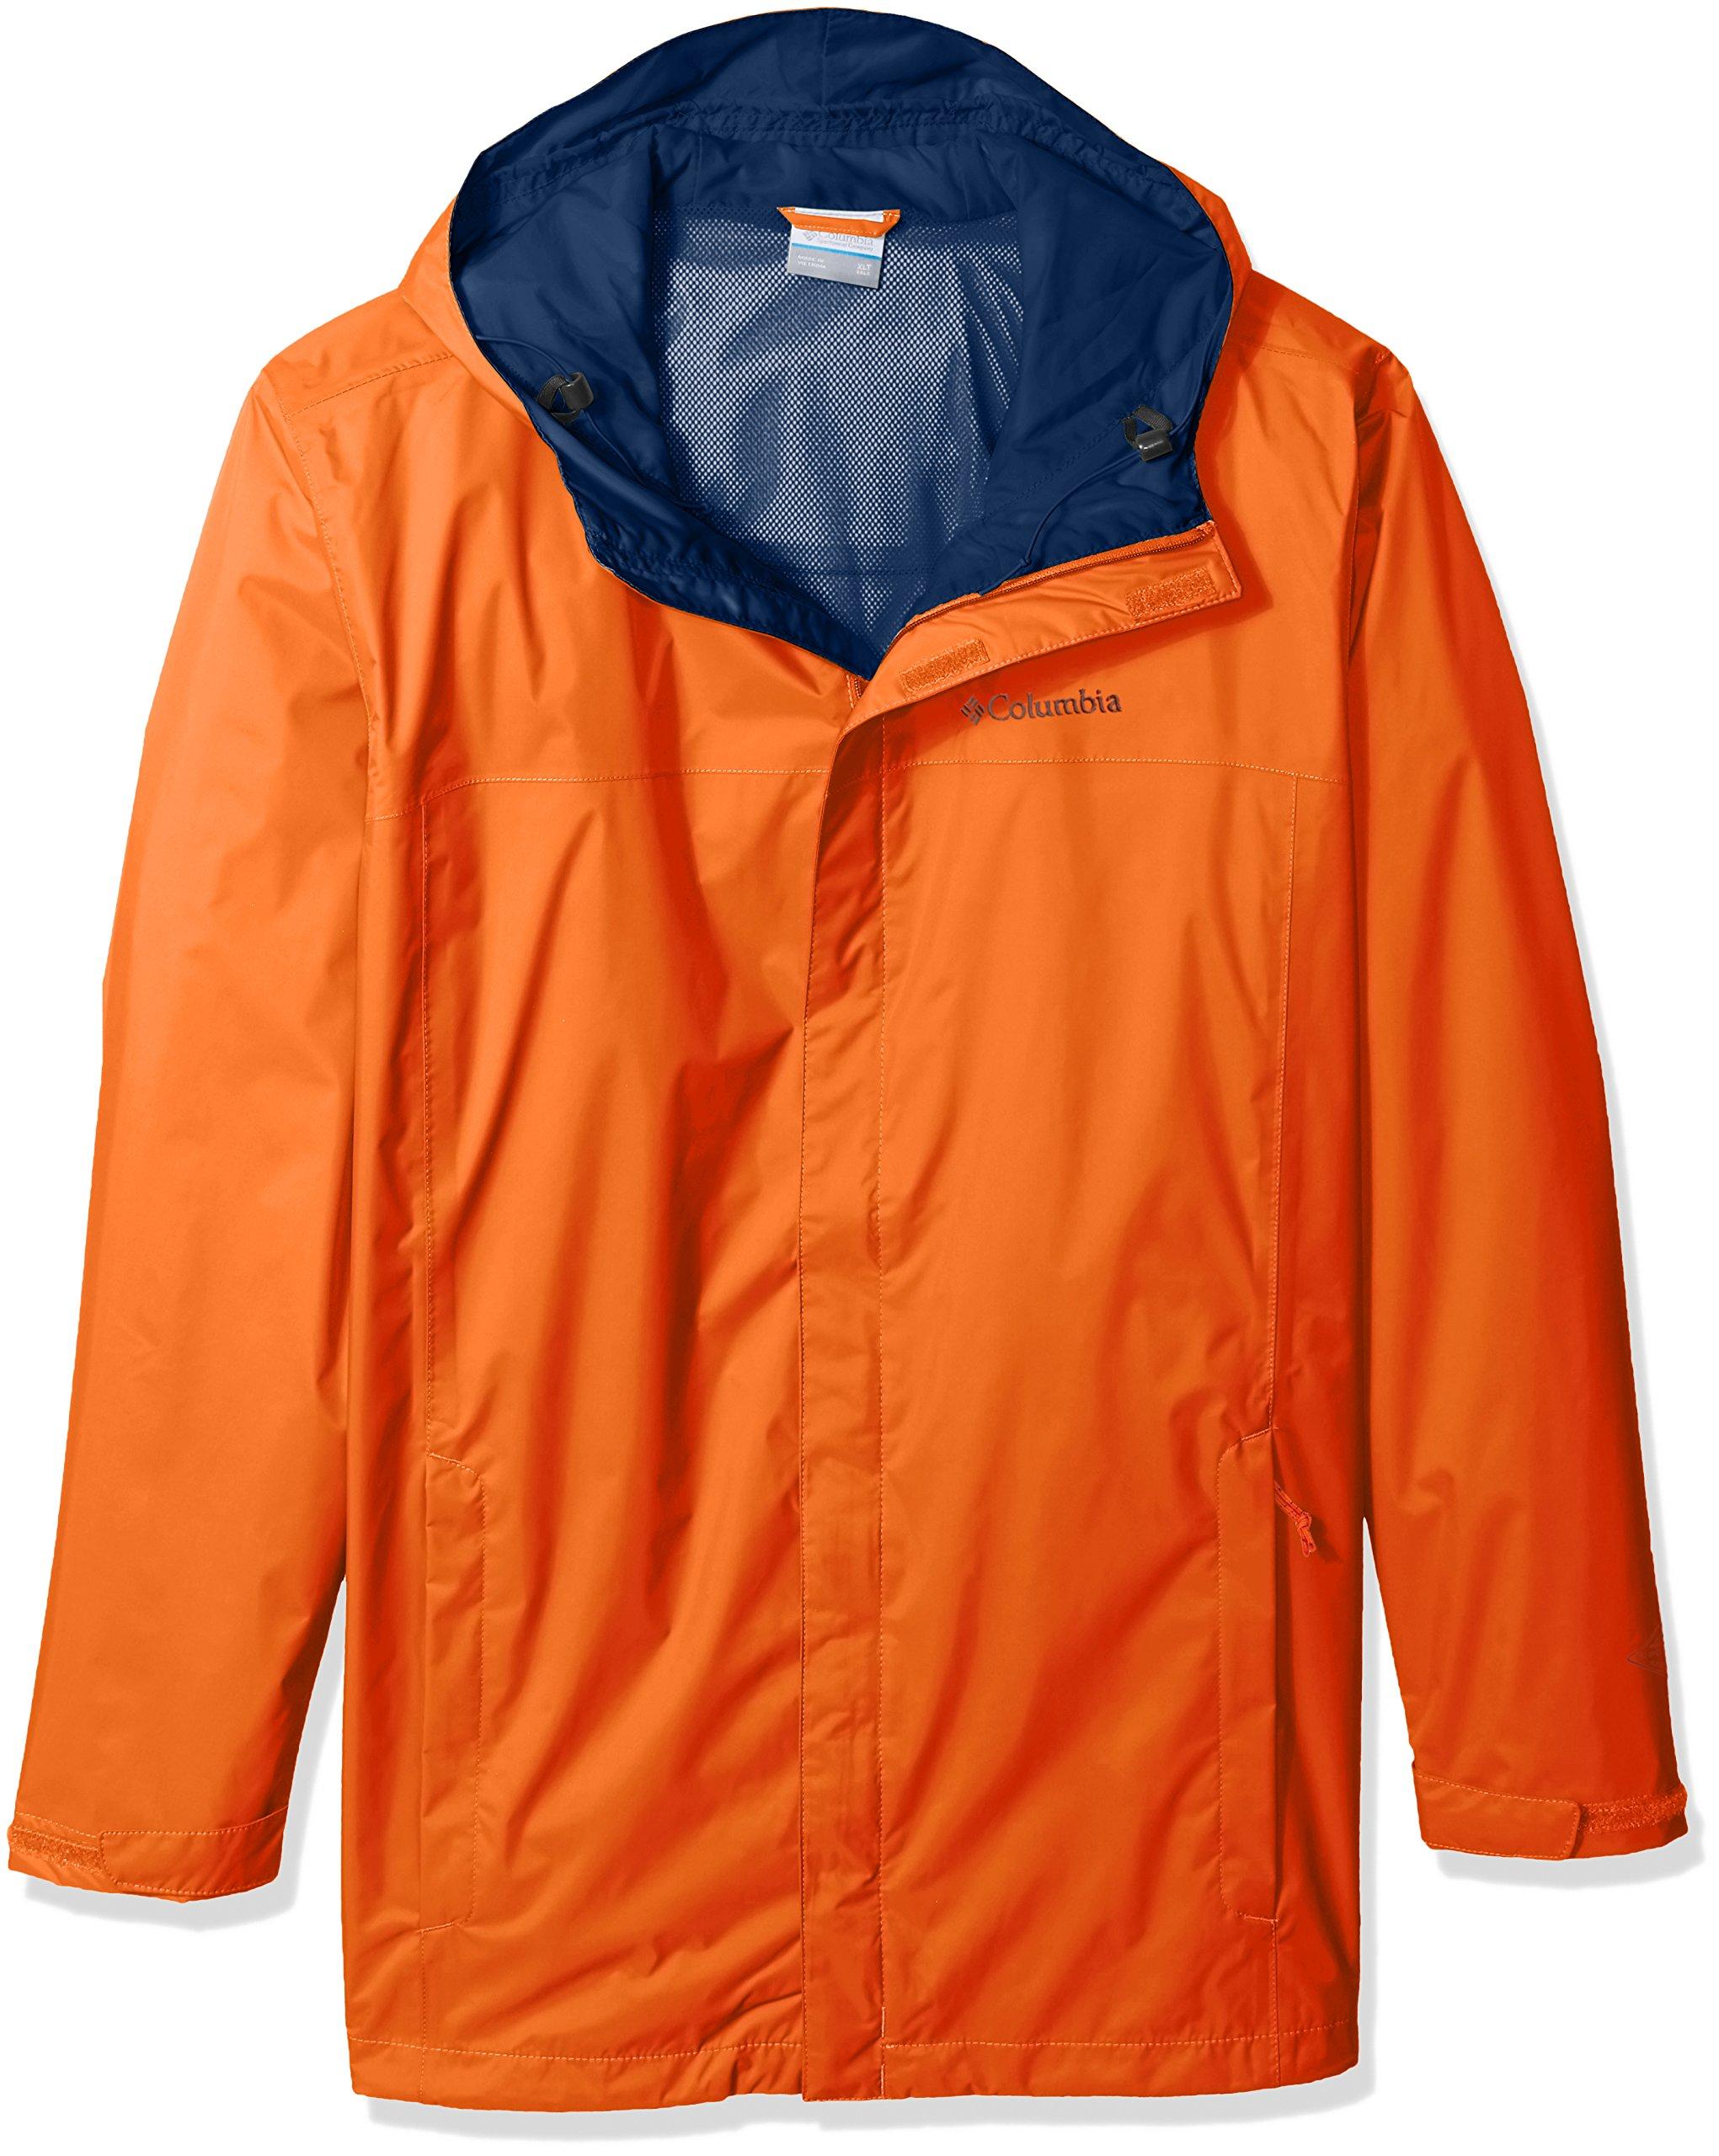 Columbia Men's Big and Tall Watertight Ii Jacket, Heatwave 3X by Columbia (Image #1)